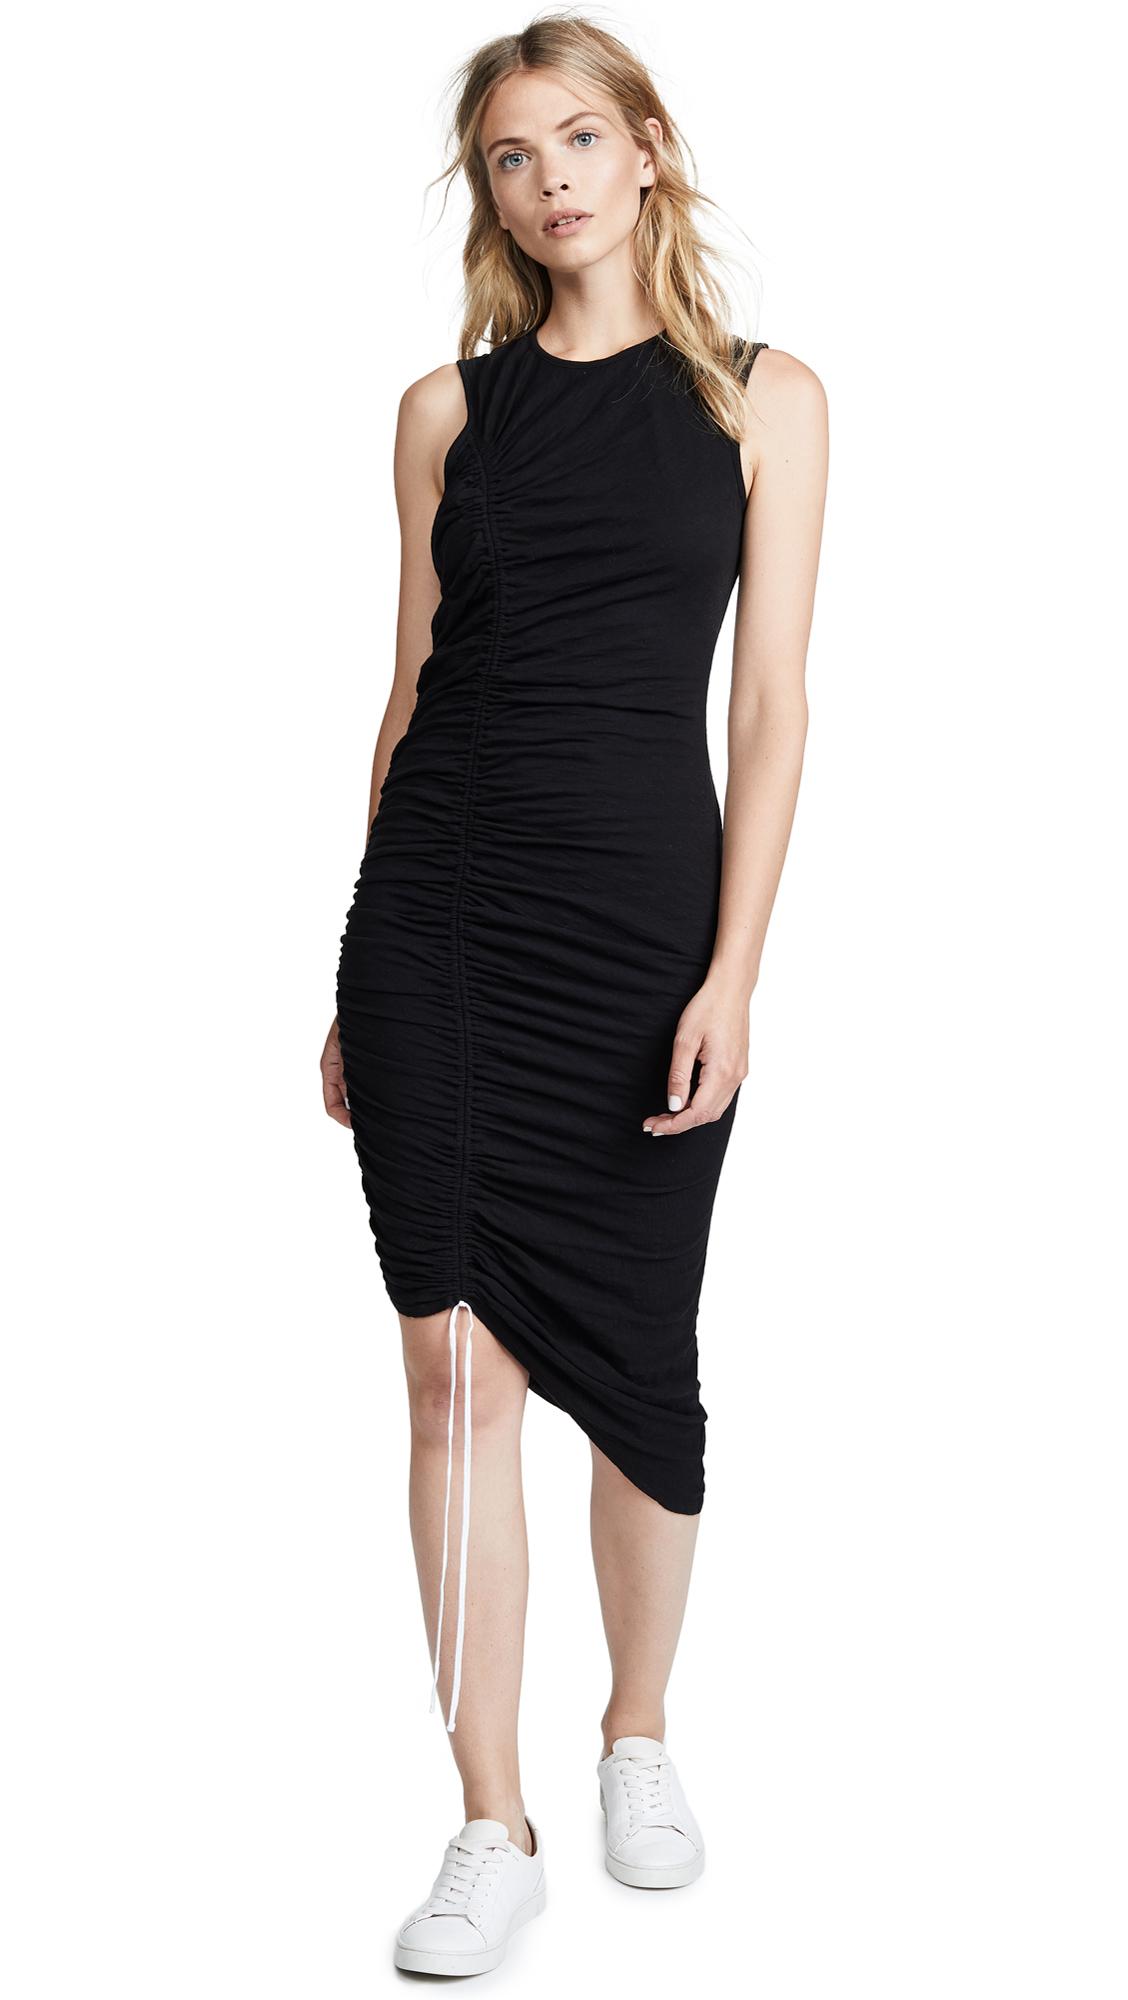 Cinq a Sept Cora Dress In Black/Ivory